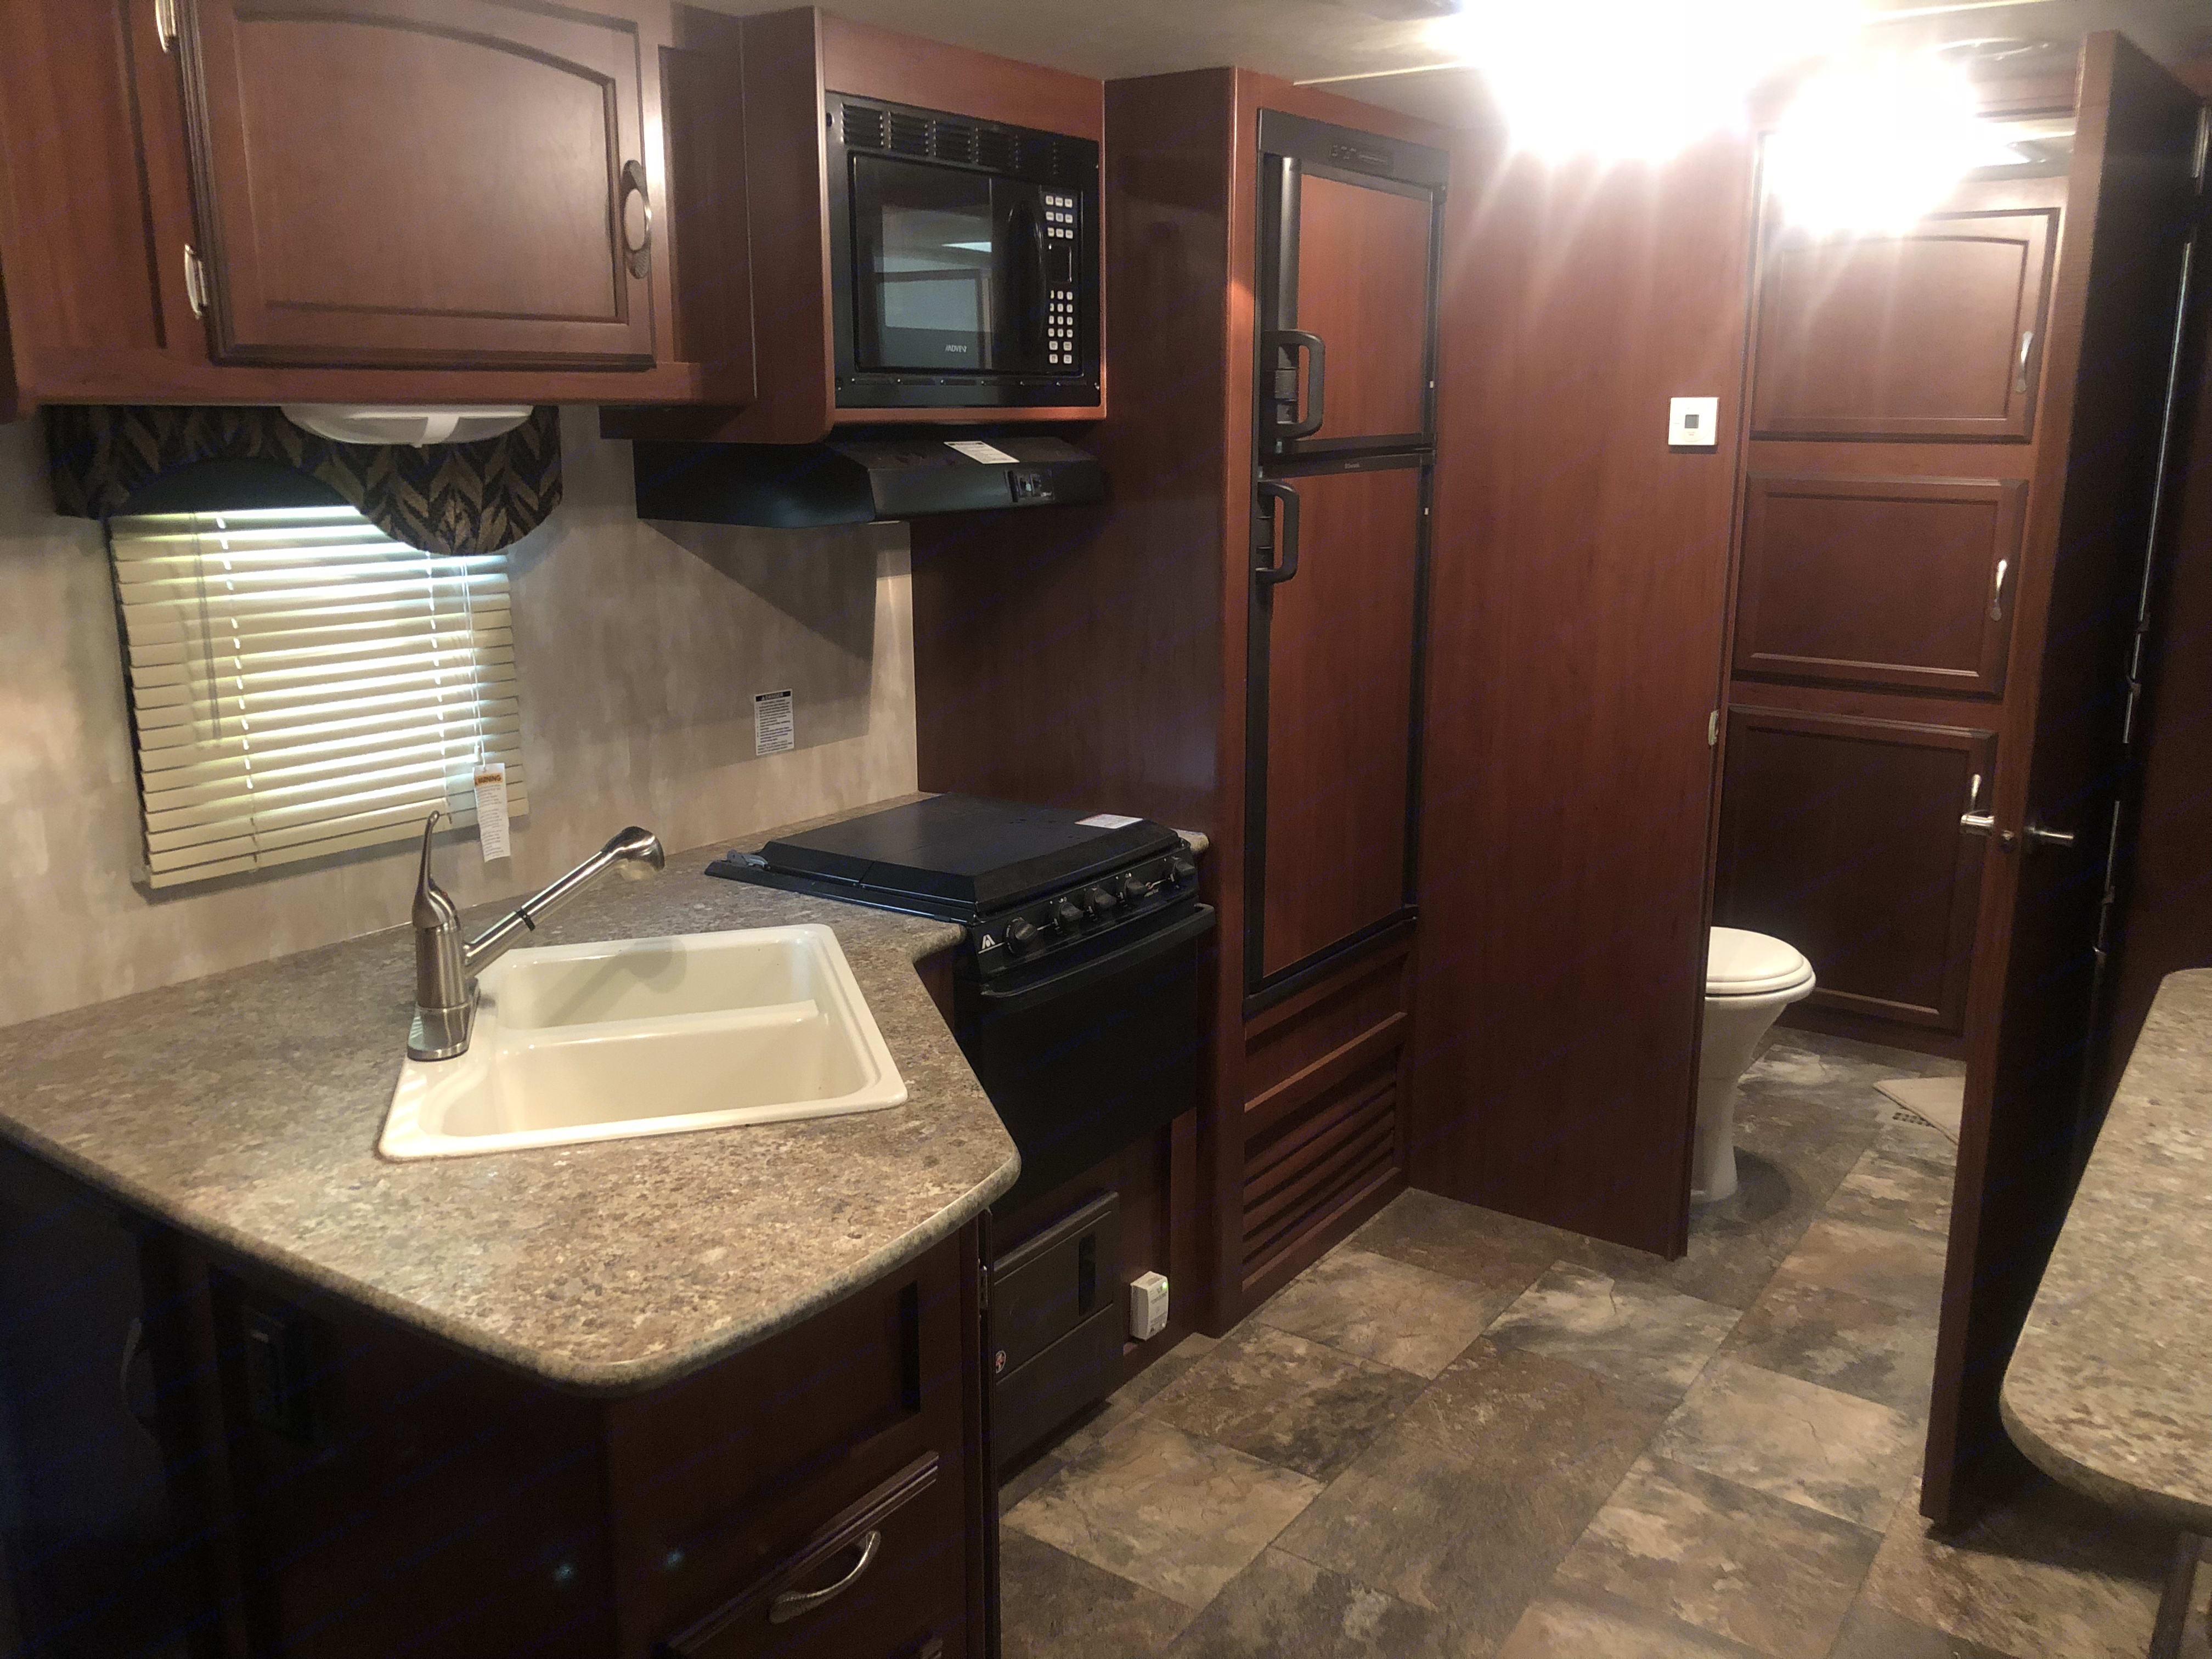 Kitchen includes sinks, oven, 3 burner stove, microwave, fridge and freezer. . Winnebago Minnie Winnie 2015